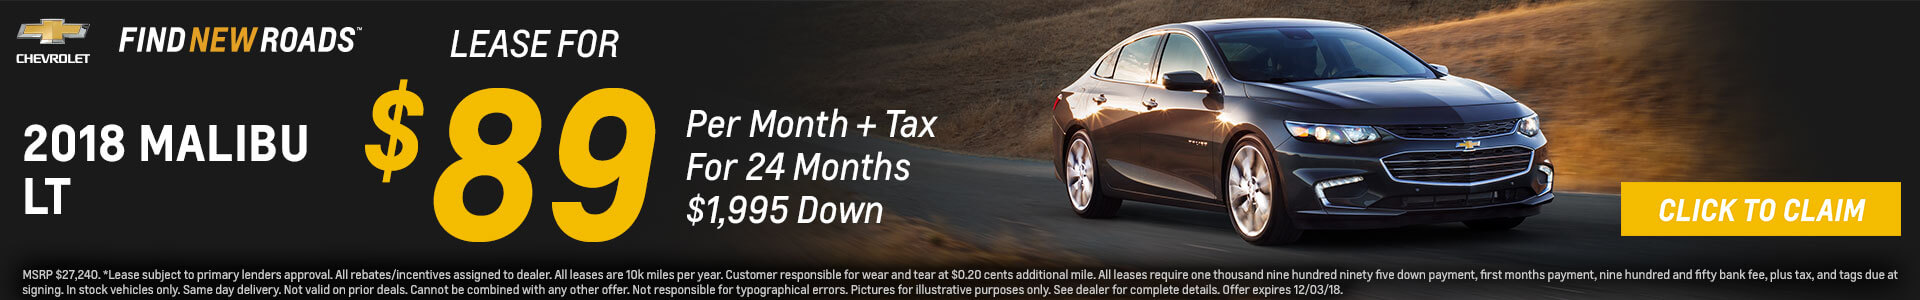 Chevrolet Malibu $89 Lease